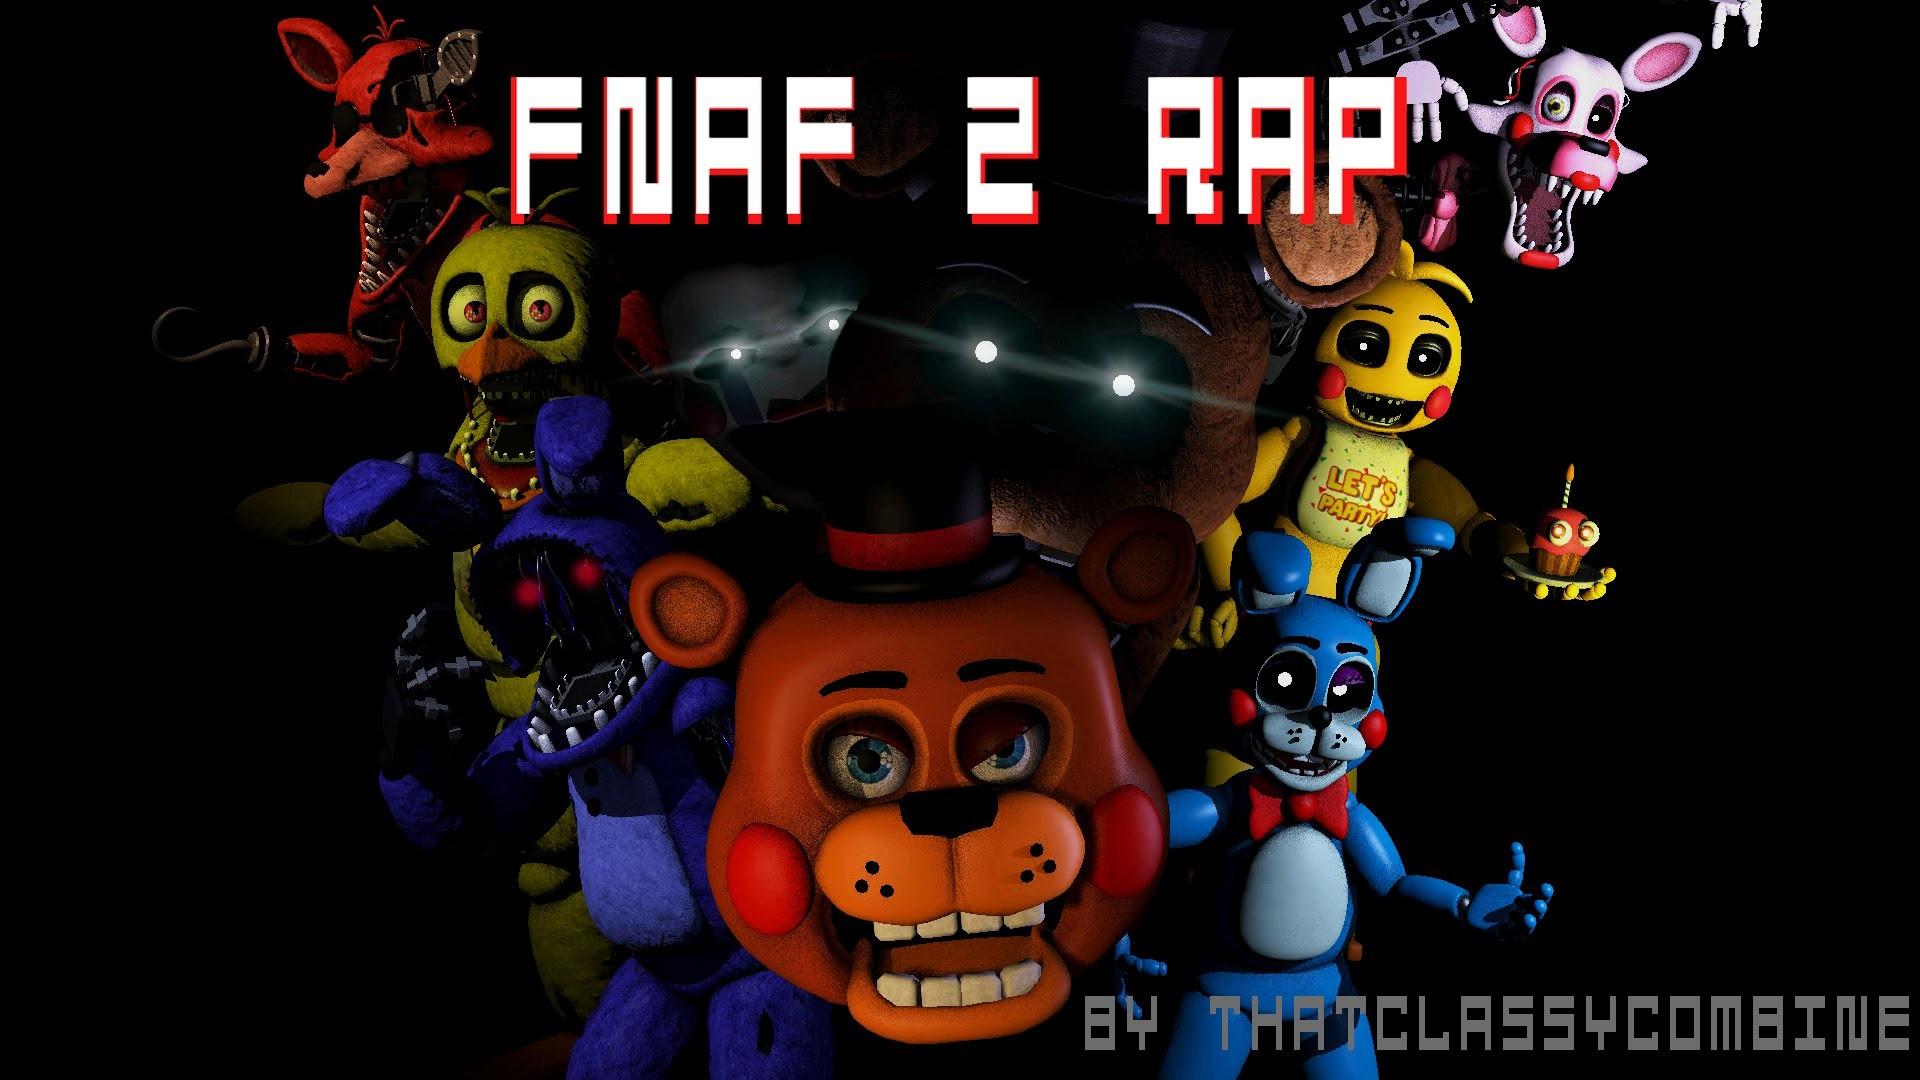 [SFM] FNAF 2 Rap Animated – Five More Nights – YouTube